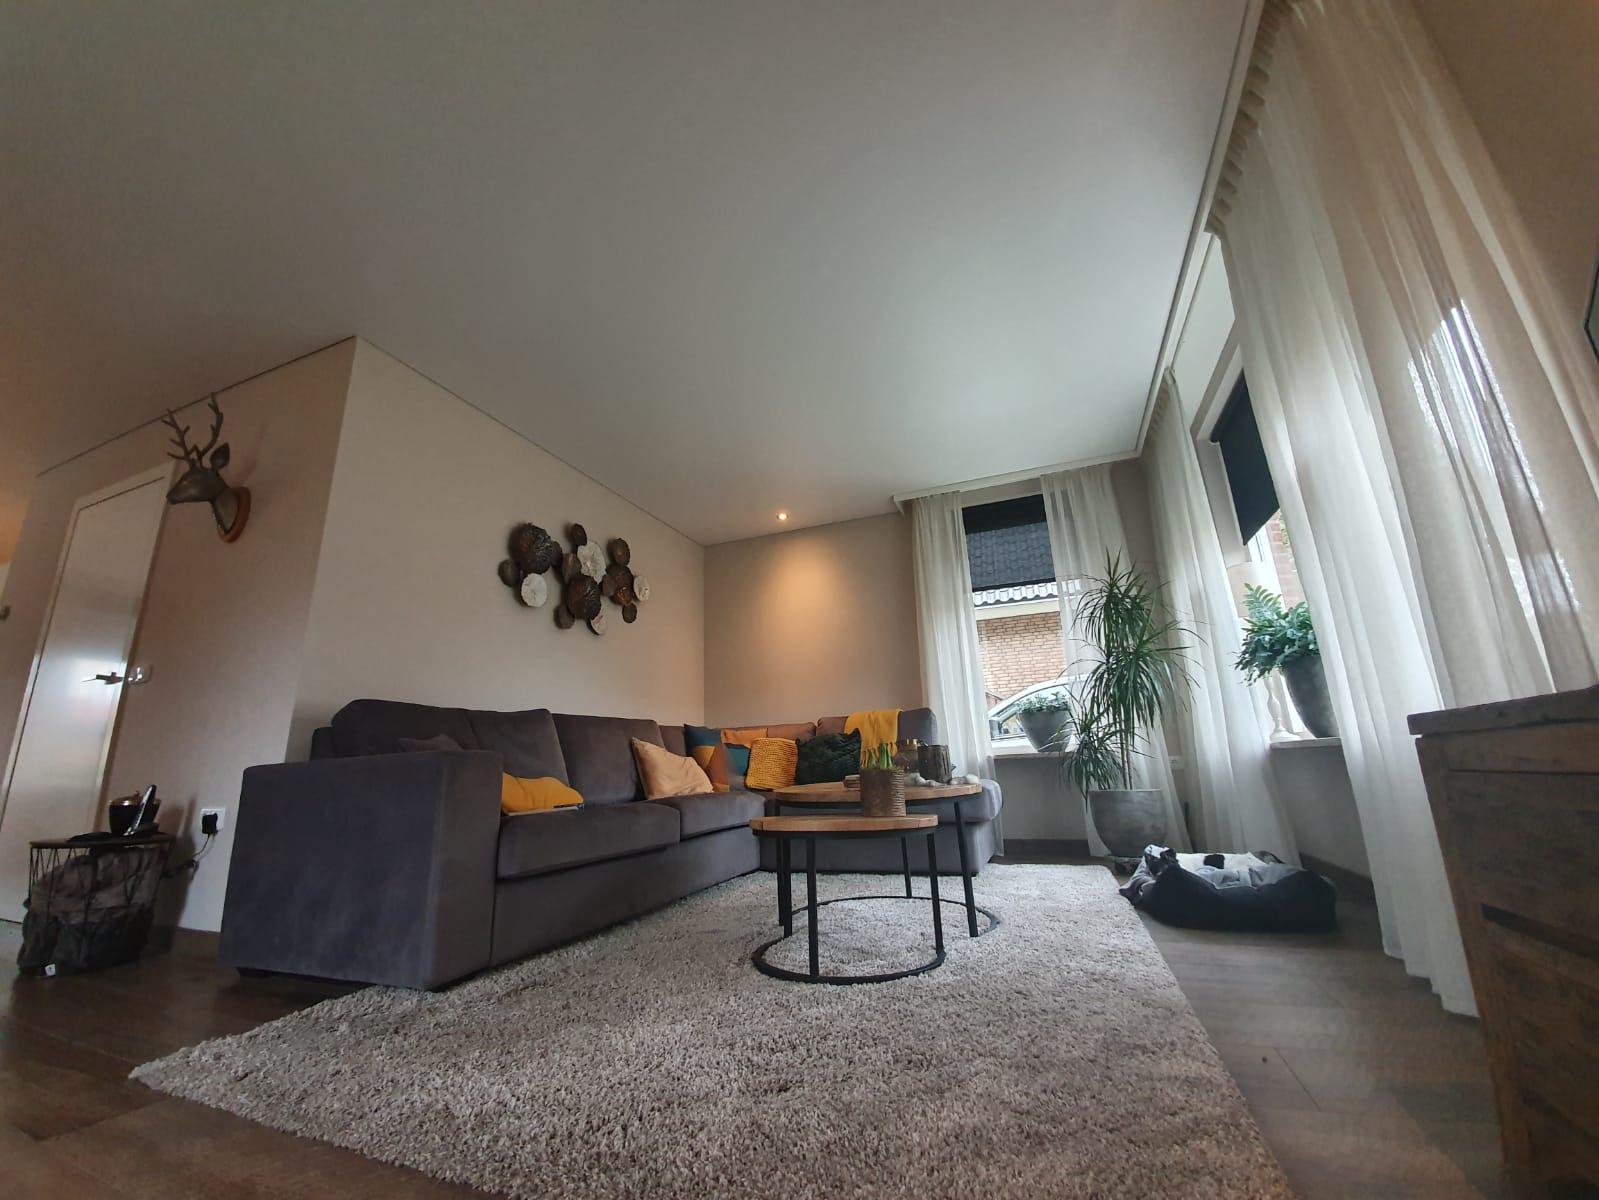 plafond met spot lights in woonkamers